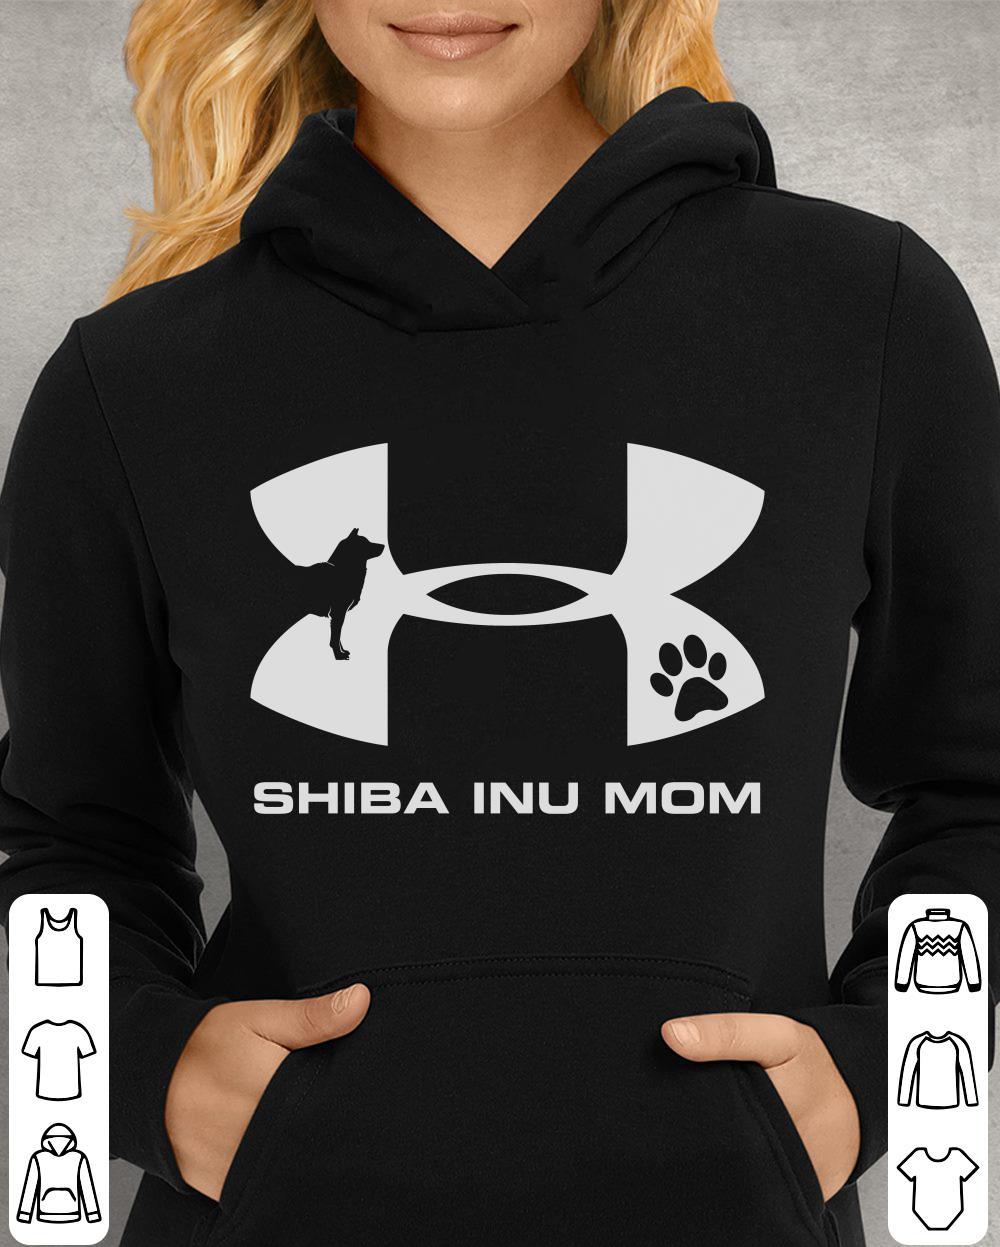 https://unicornshirts.net/images/2018/12/Under-Armour-Shiba-Inu-Mom-Shirt_4.jpg